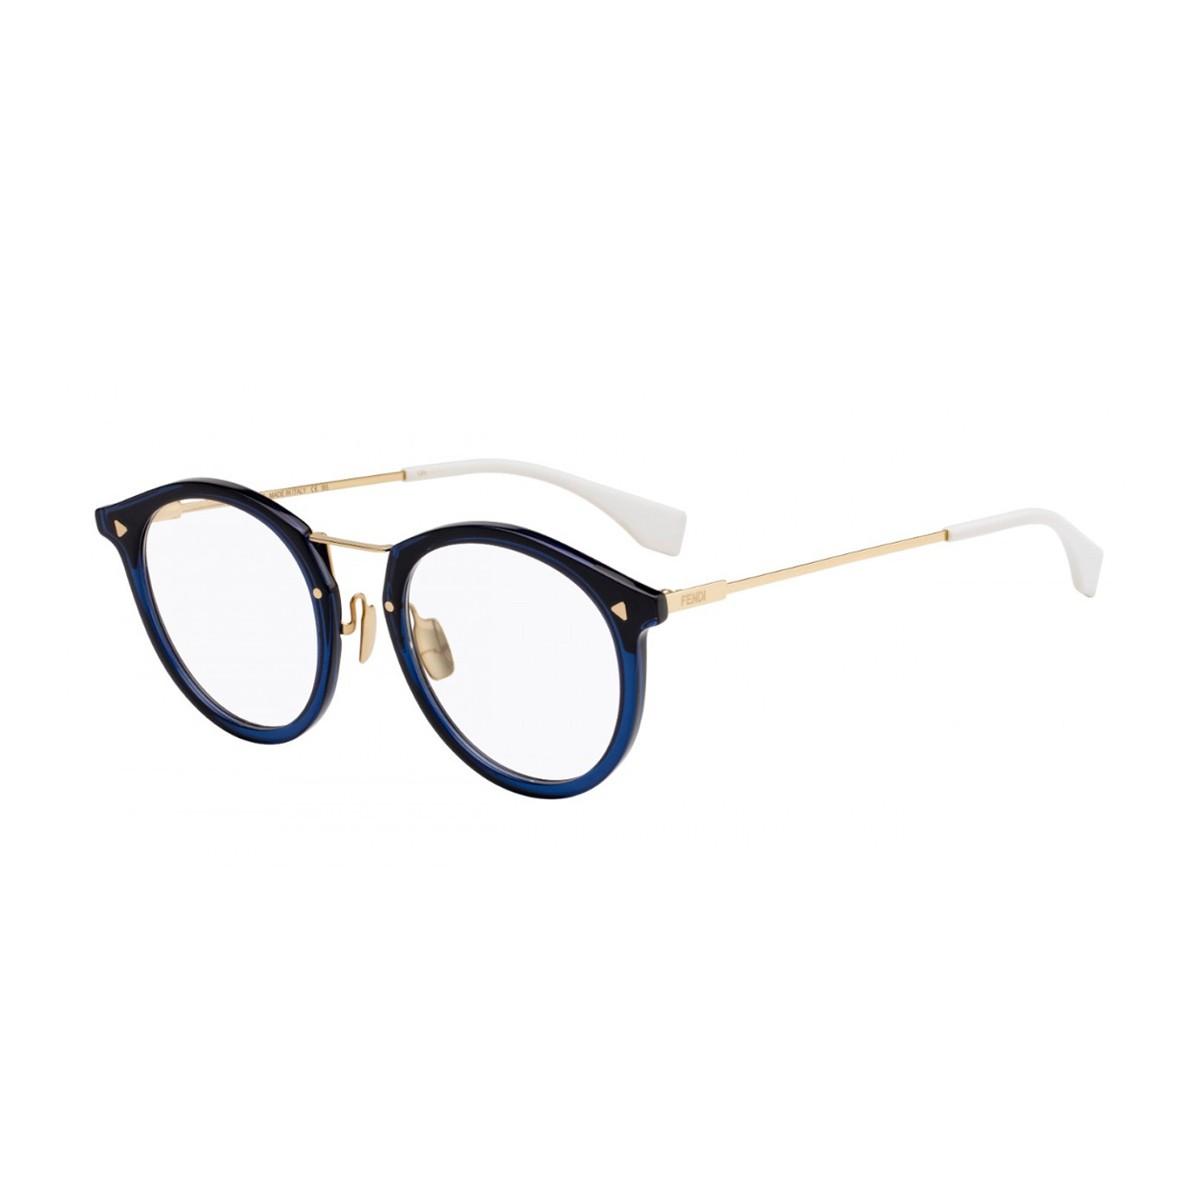 Fendi FF M0050 | Occhiali da vista Unisex